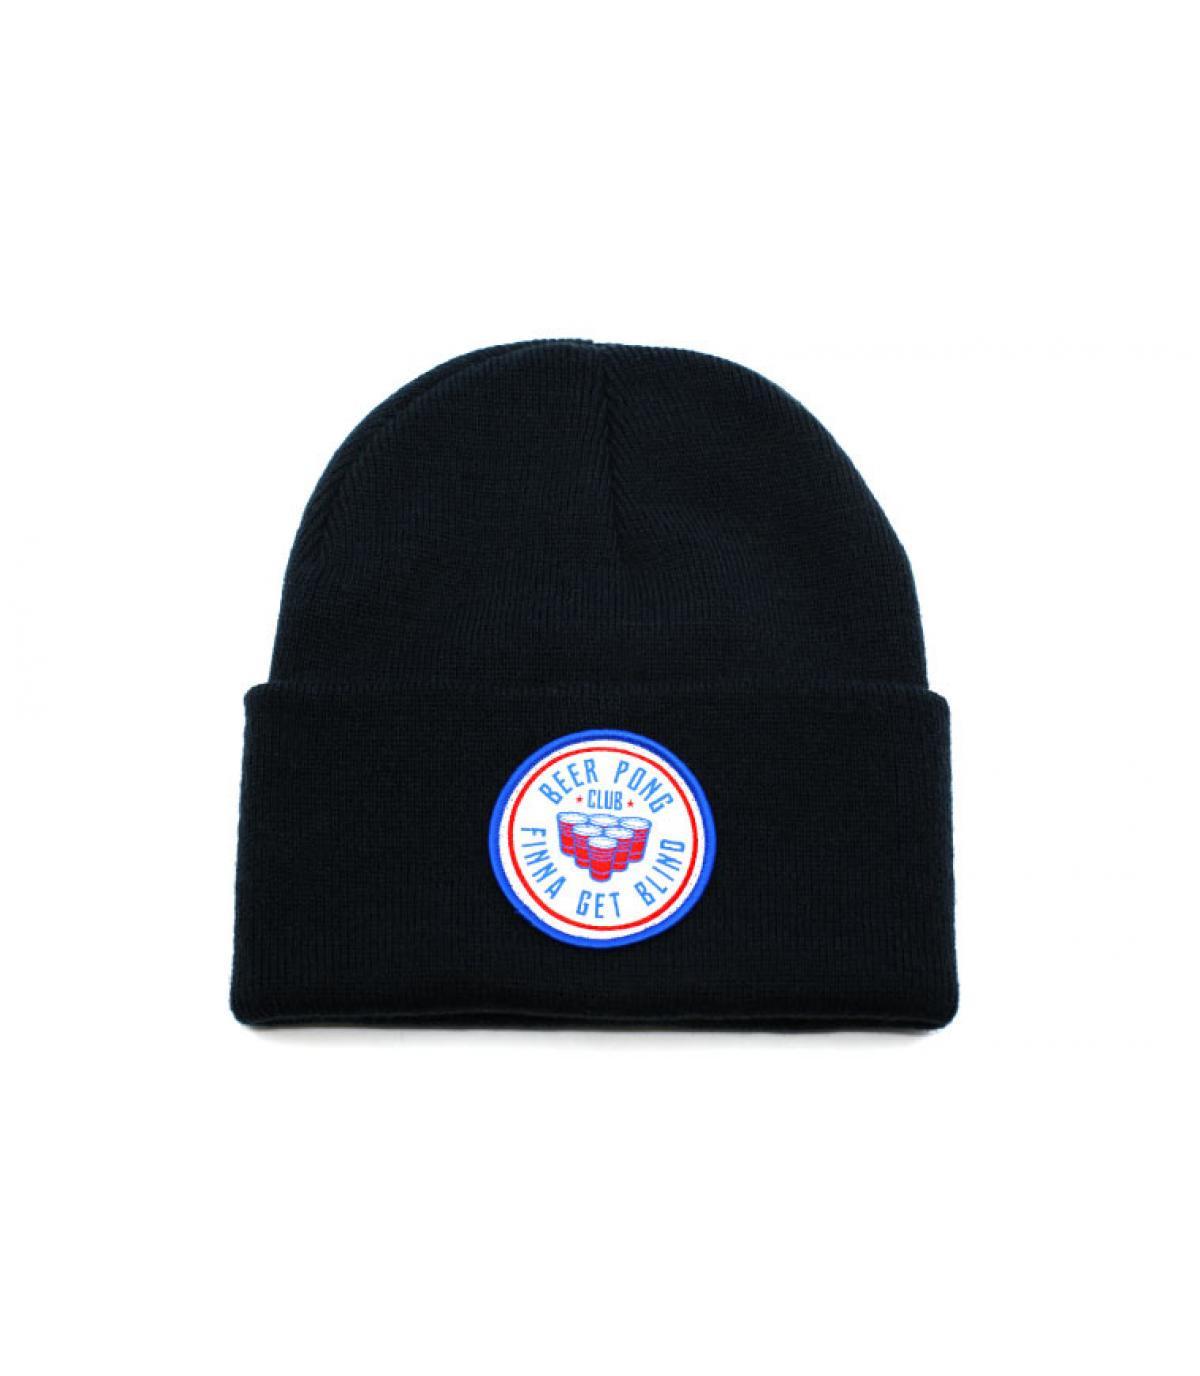 Mütze Beer Pong blau